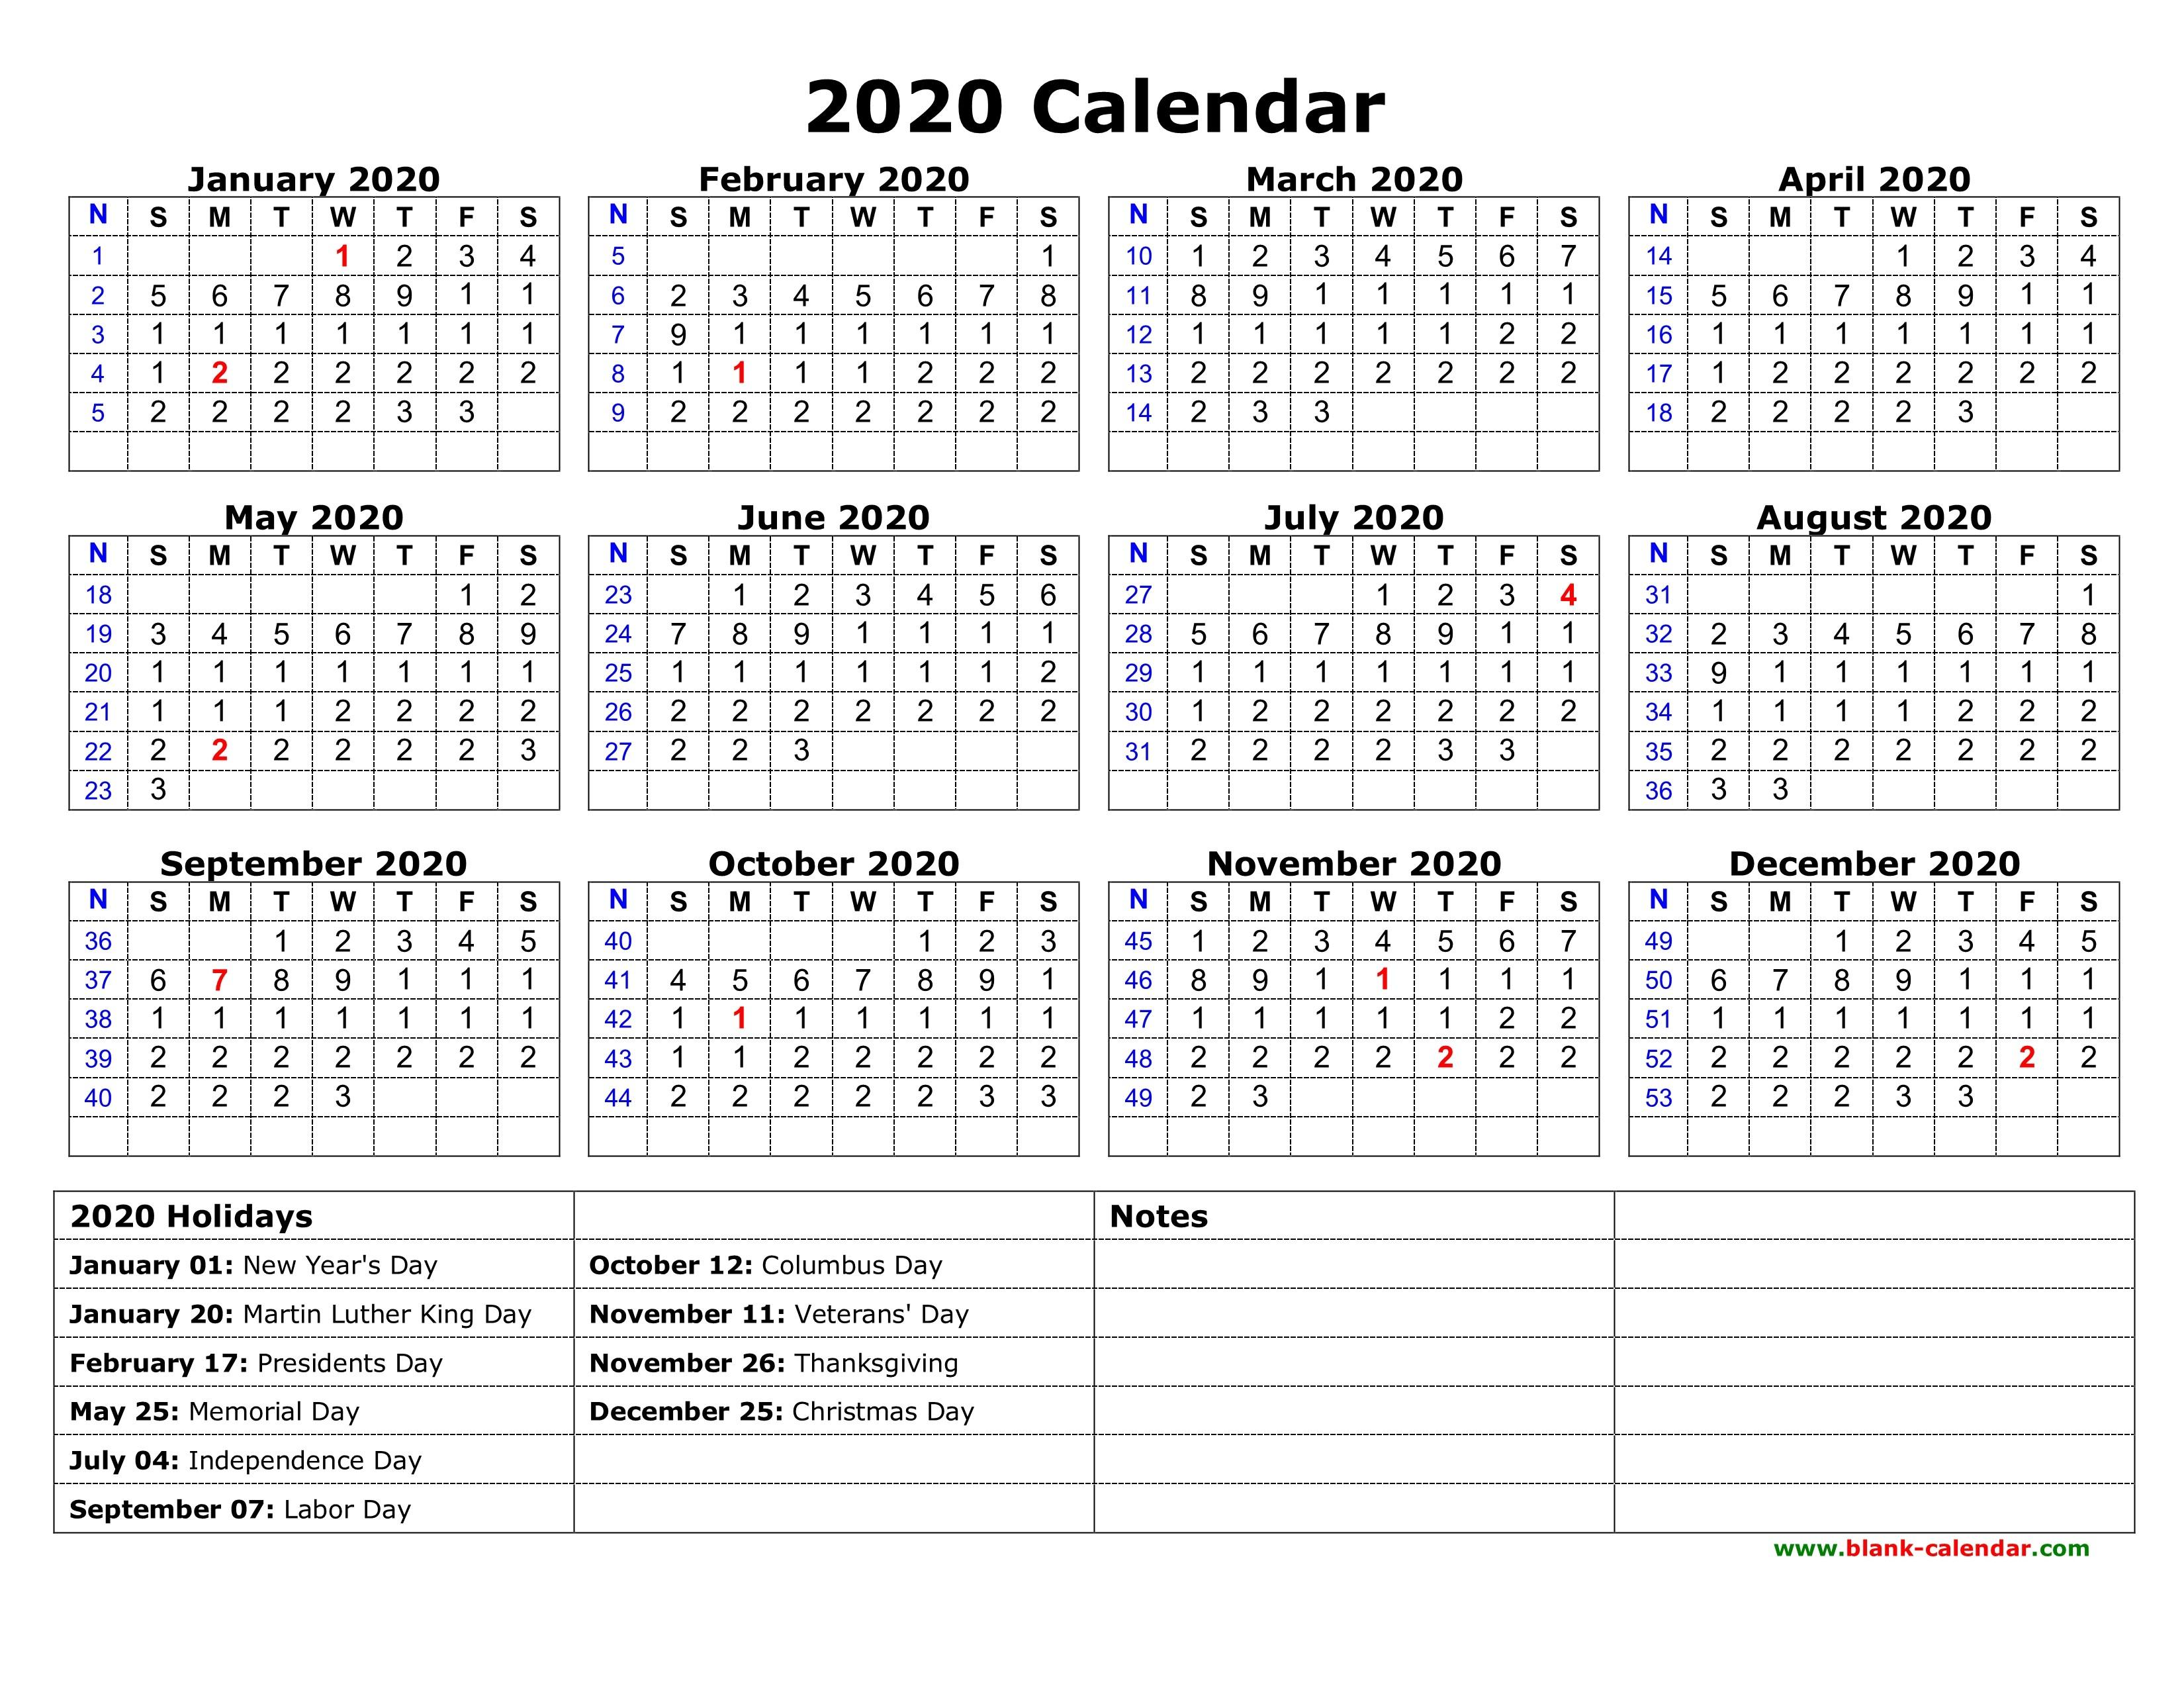 Free Printable 2020 Calendar With Holidays 2 - Crearphpnuke regarding 2020 Vertex Calendars Printable Free